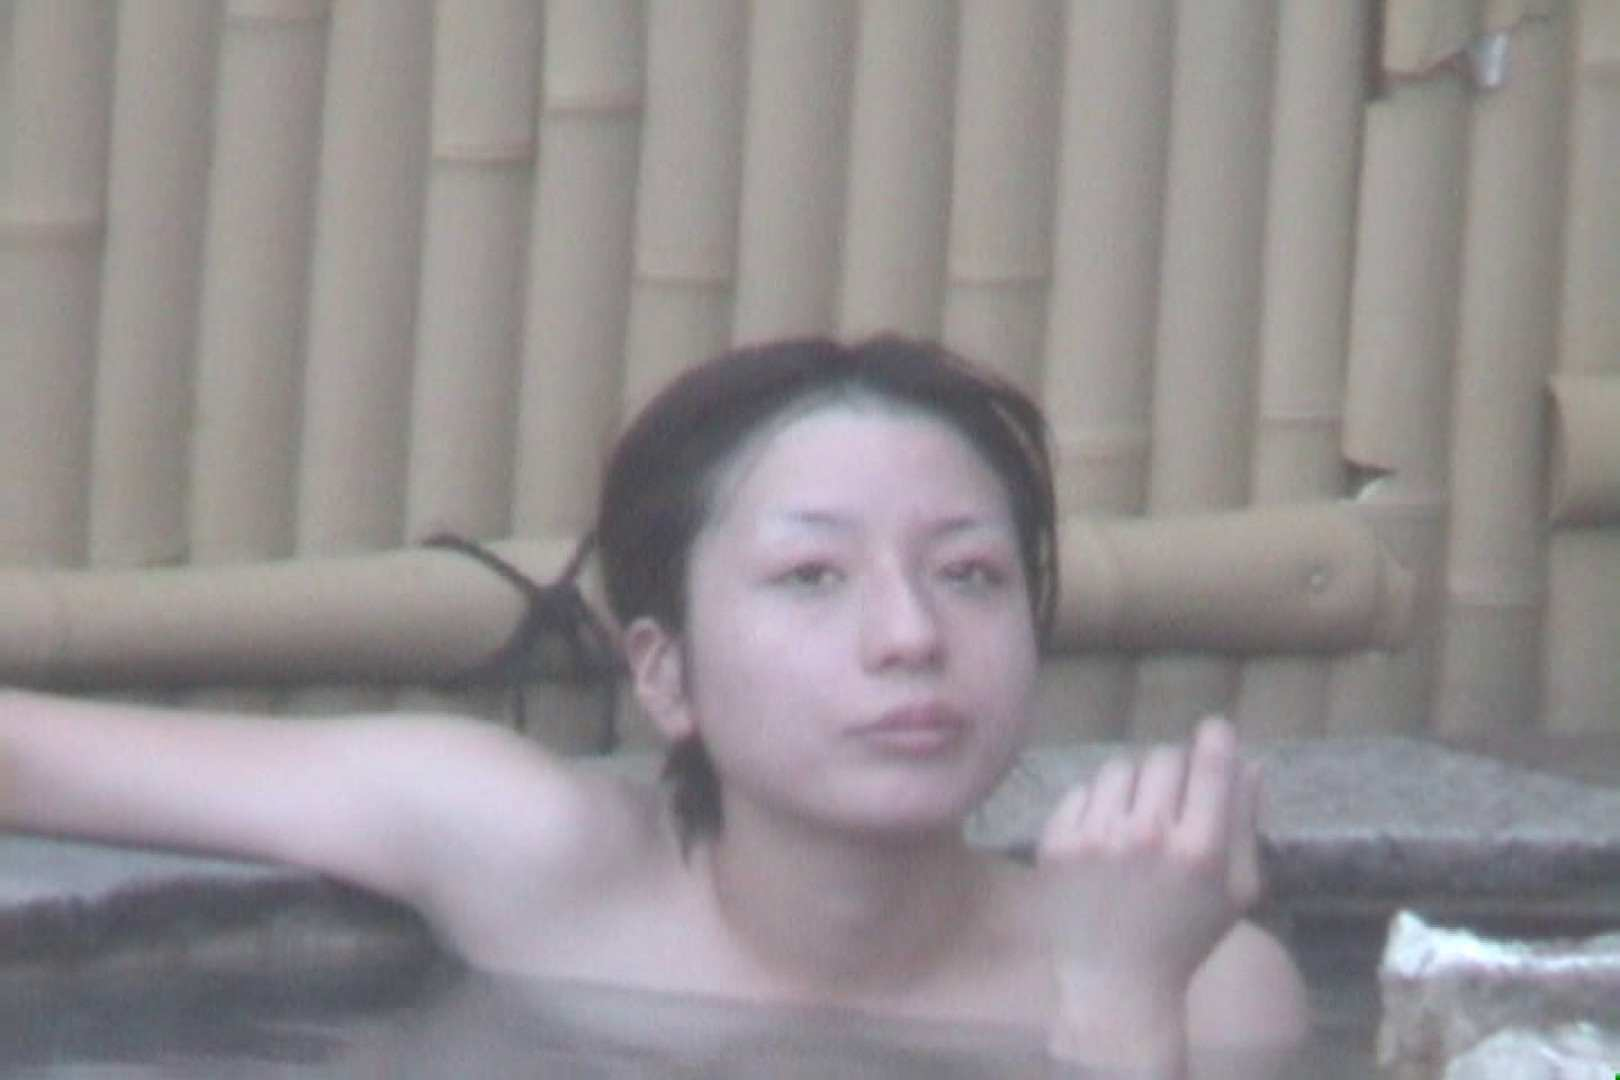 Aquaな露天風呂Vol.608 露天風呂 | OLのエロ生活  69連発 10